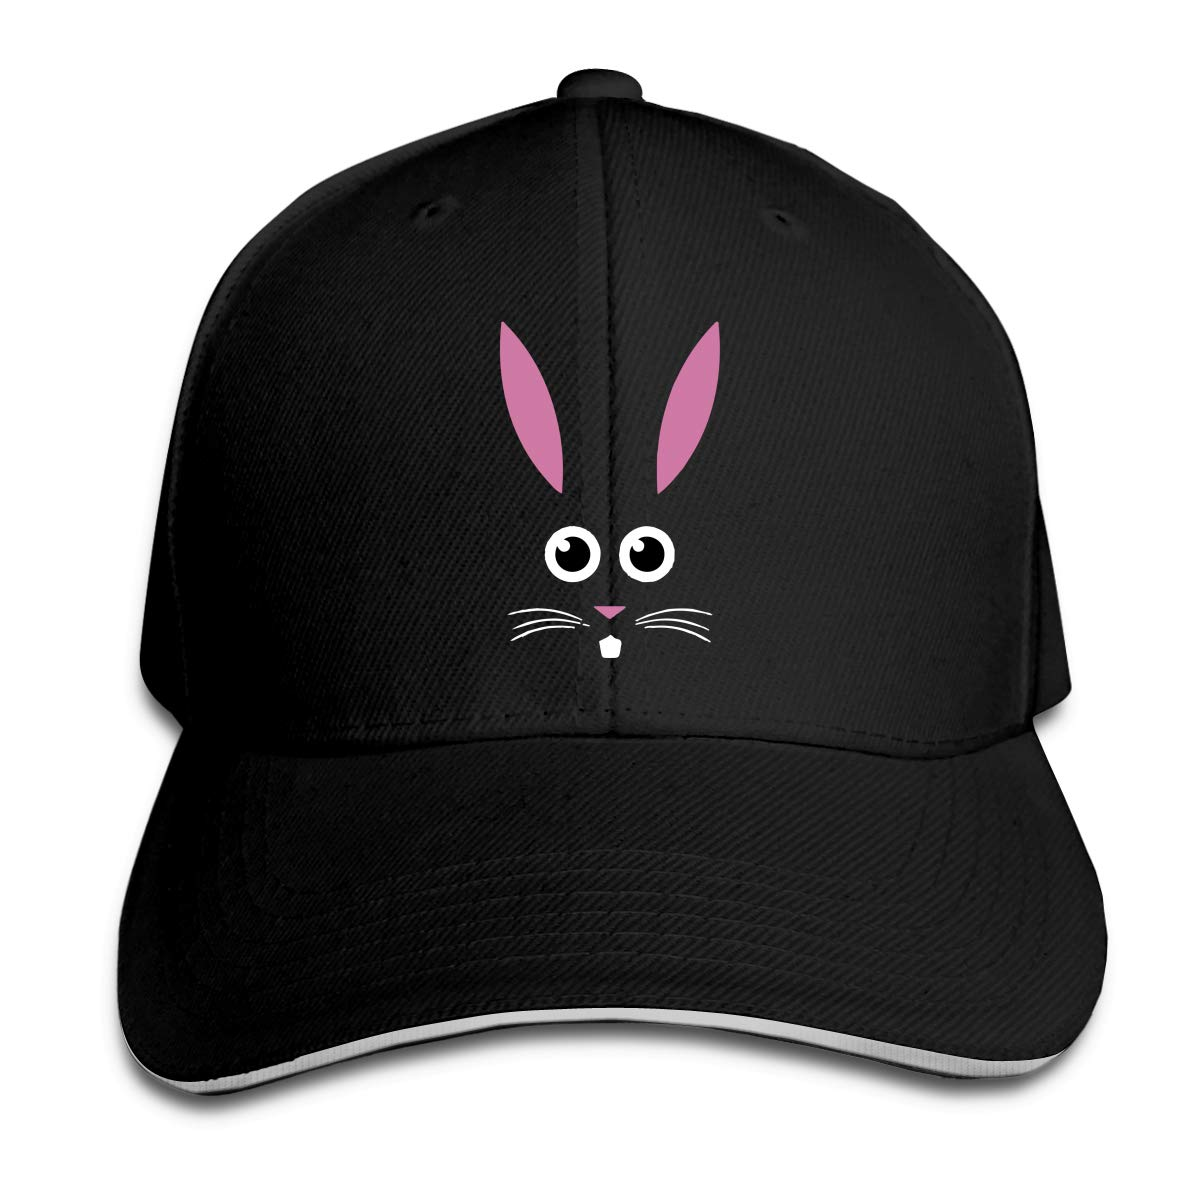 Cute Little Easter Bunny Face Outdoor Snapback Sandwich Cap Adjustable Baseball Hat Dad Hat